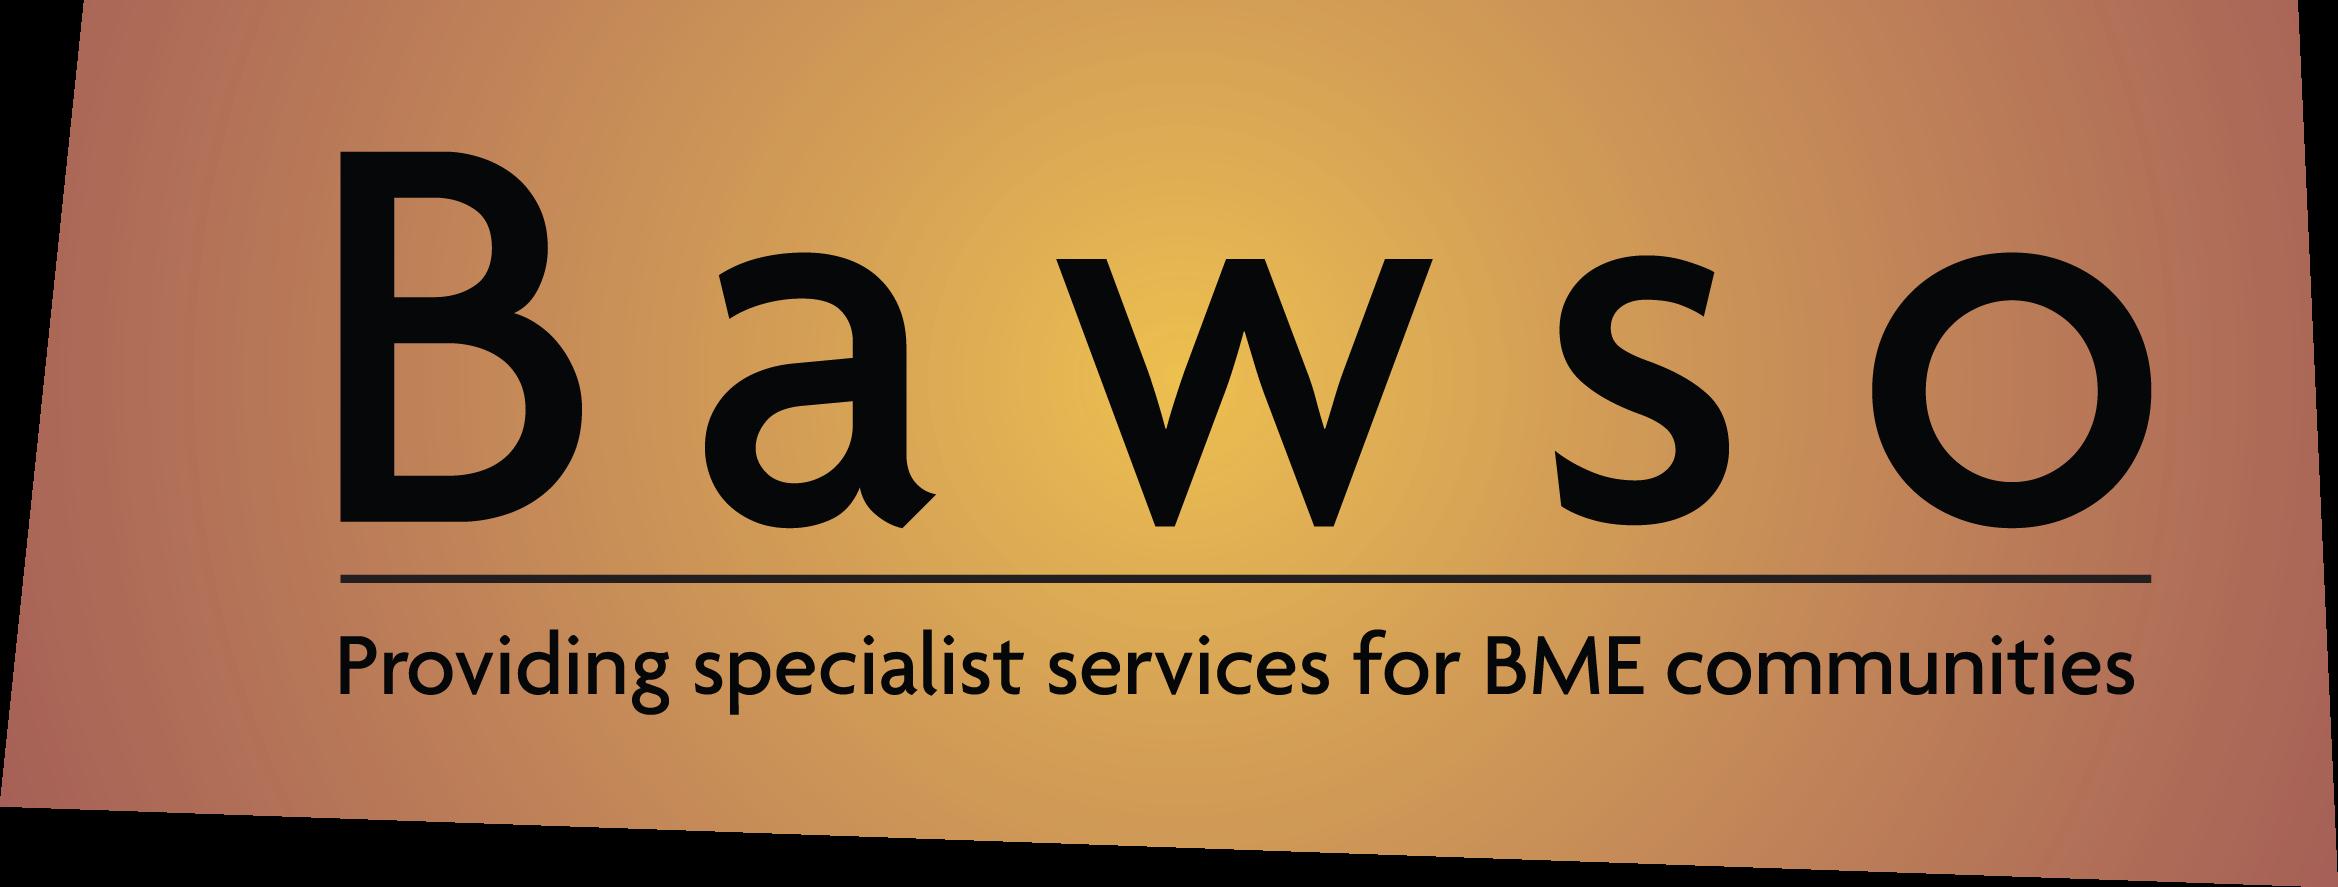 Bawso_logo